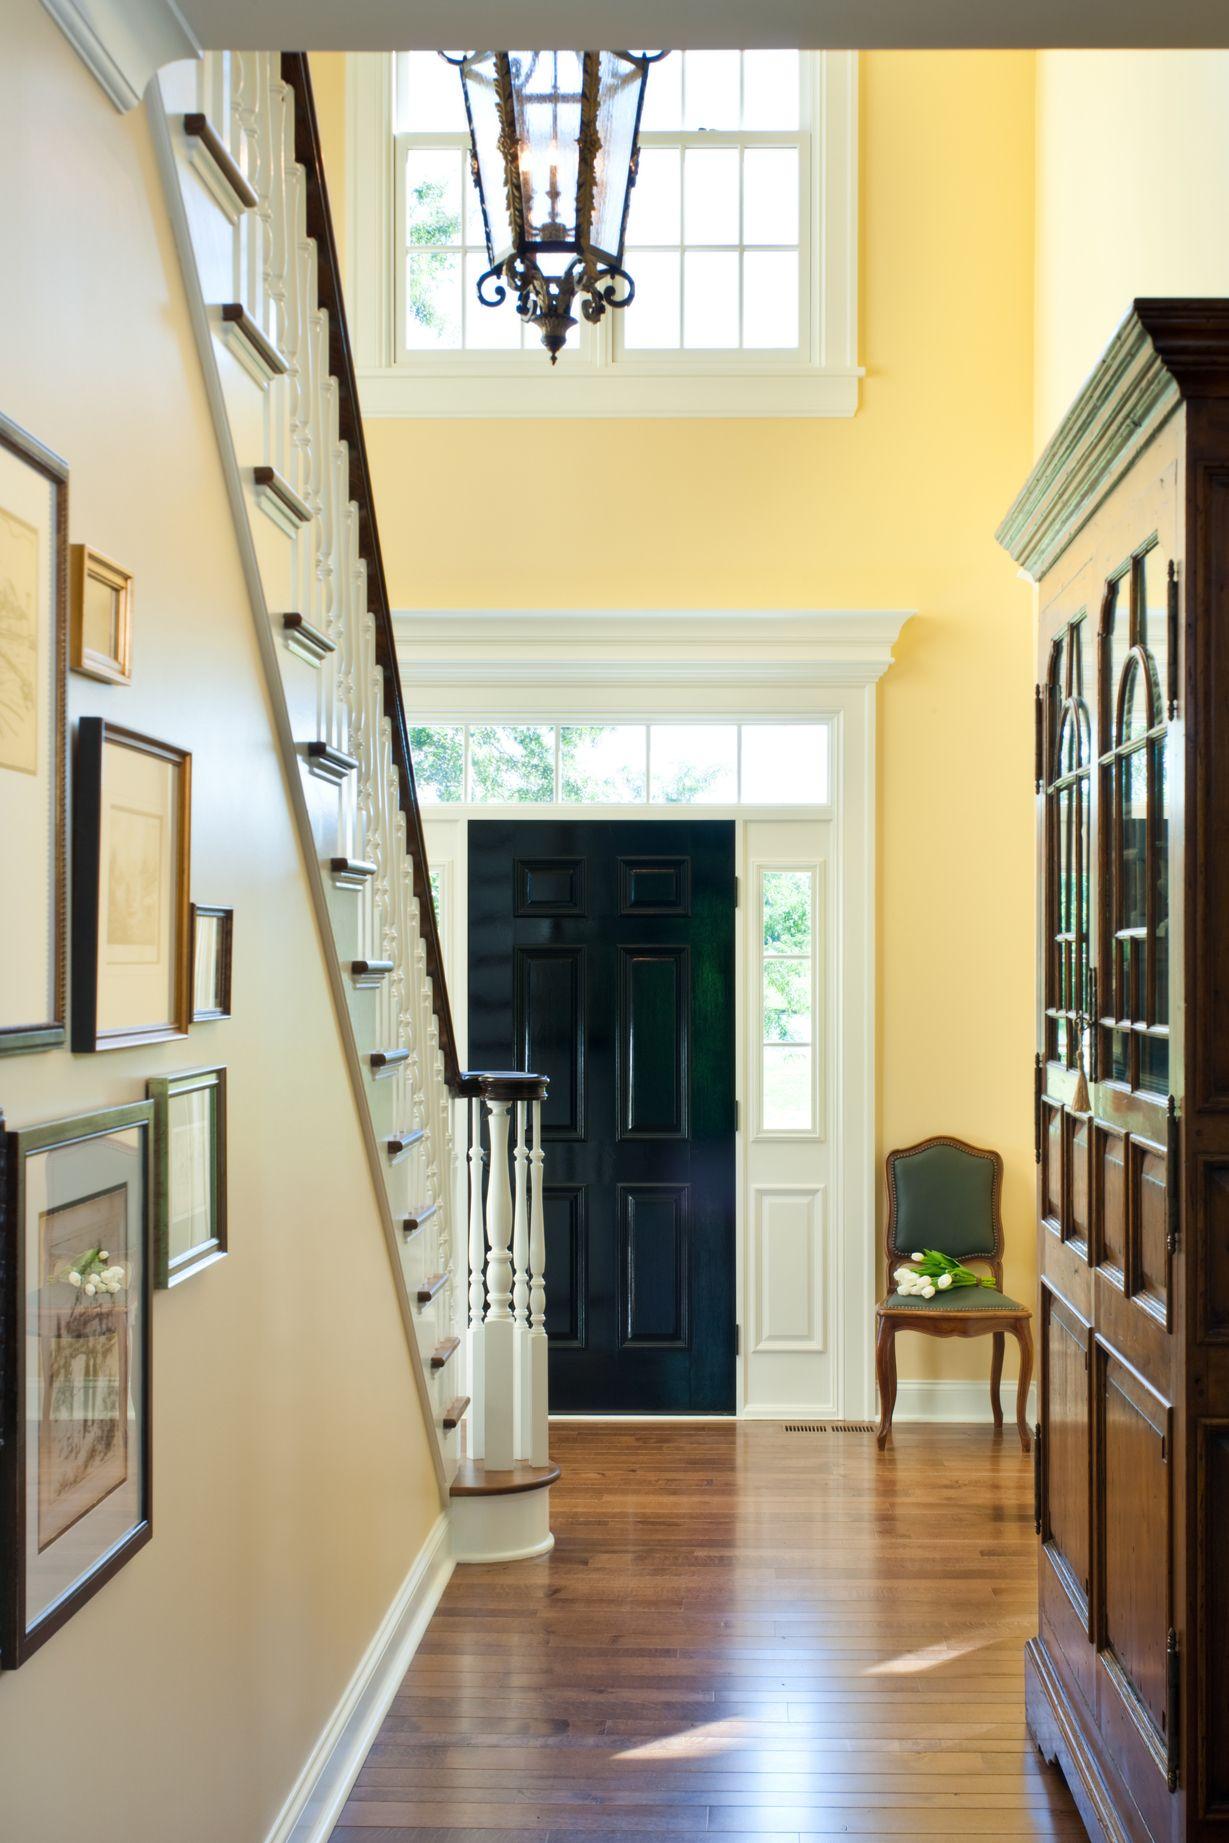 Paint doors a deep, rich, shiny black ...grand piano black ...